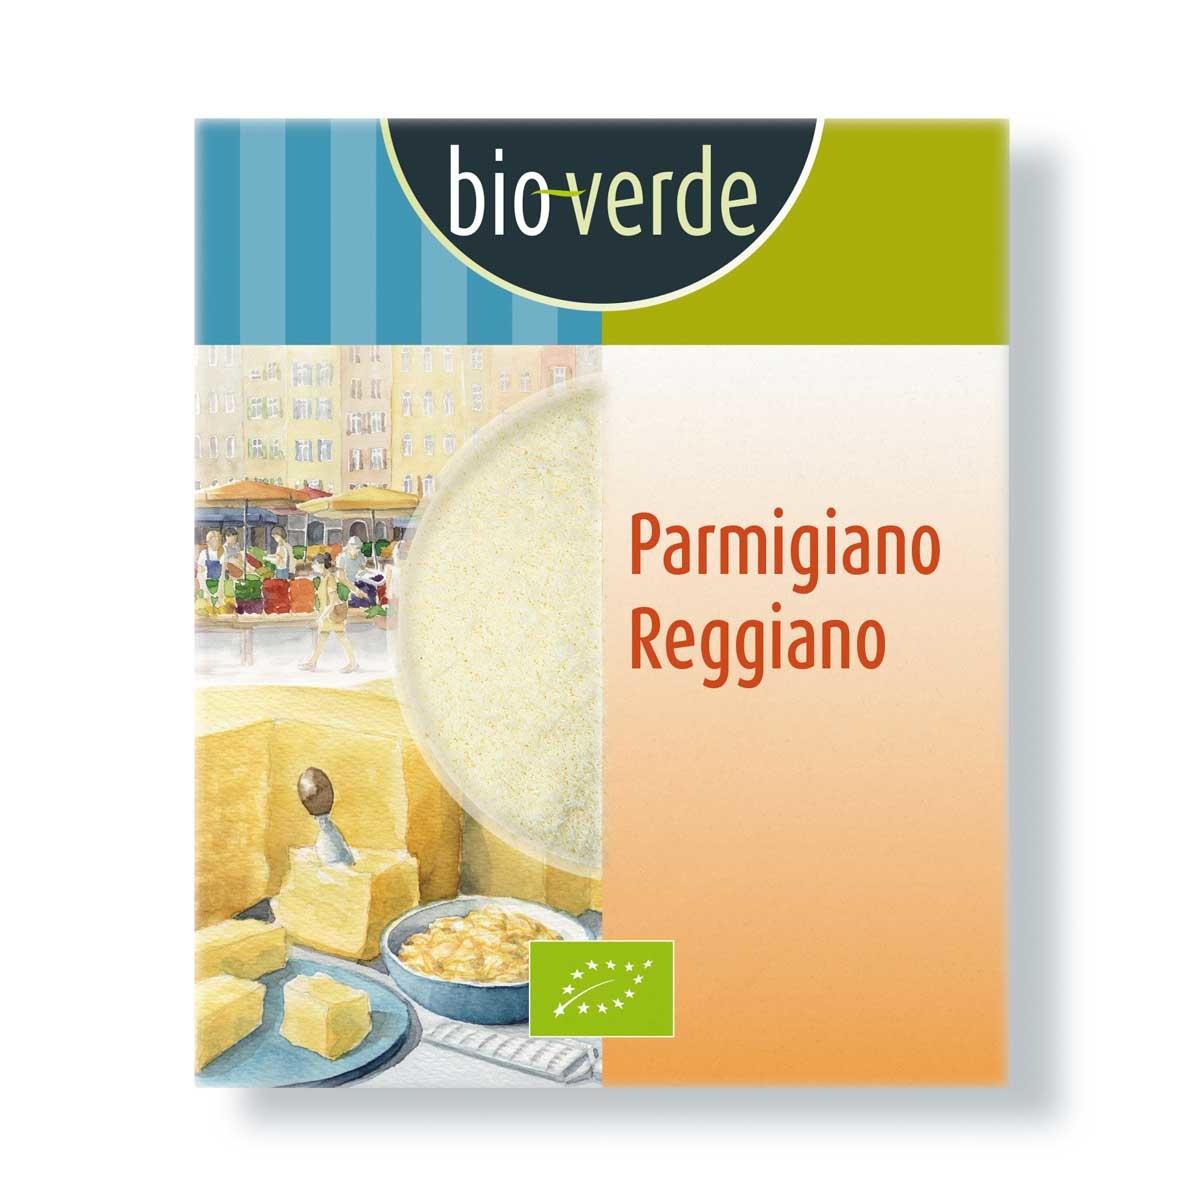 Bioverde parmigiano reggiano geraspt Biologisch